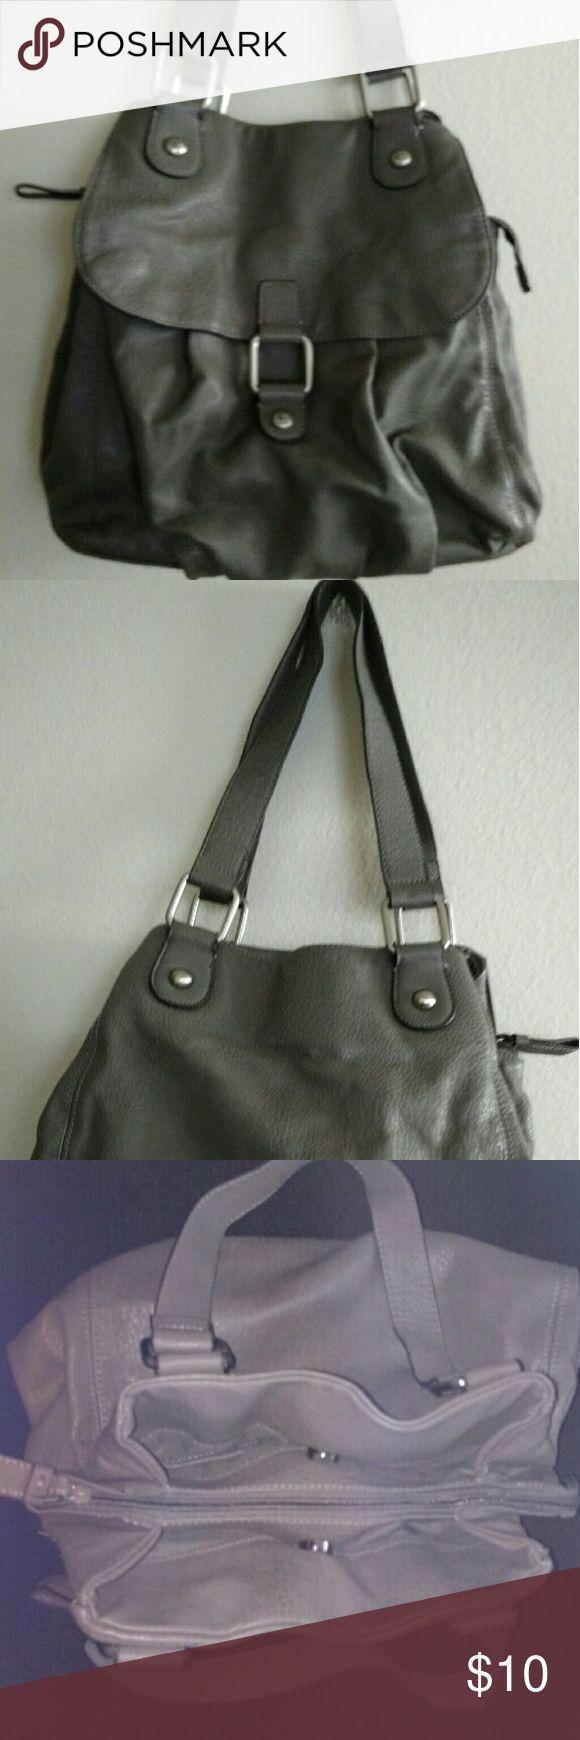 Grey shoulder bag Roomy Comfortable lightly used shoulder bag Liz Claiborne Bags Shoulder Bags